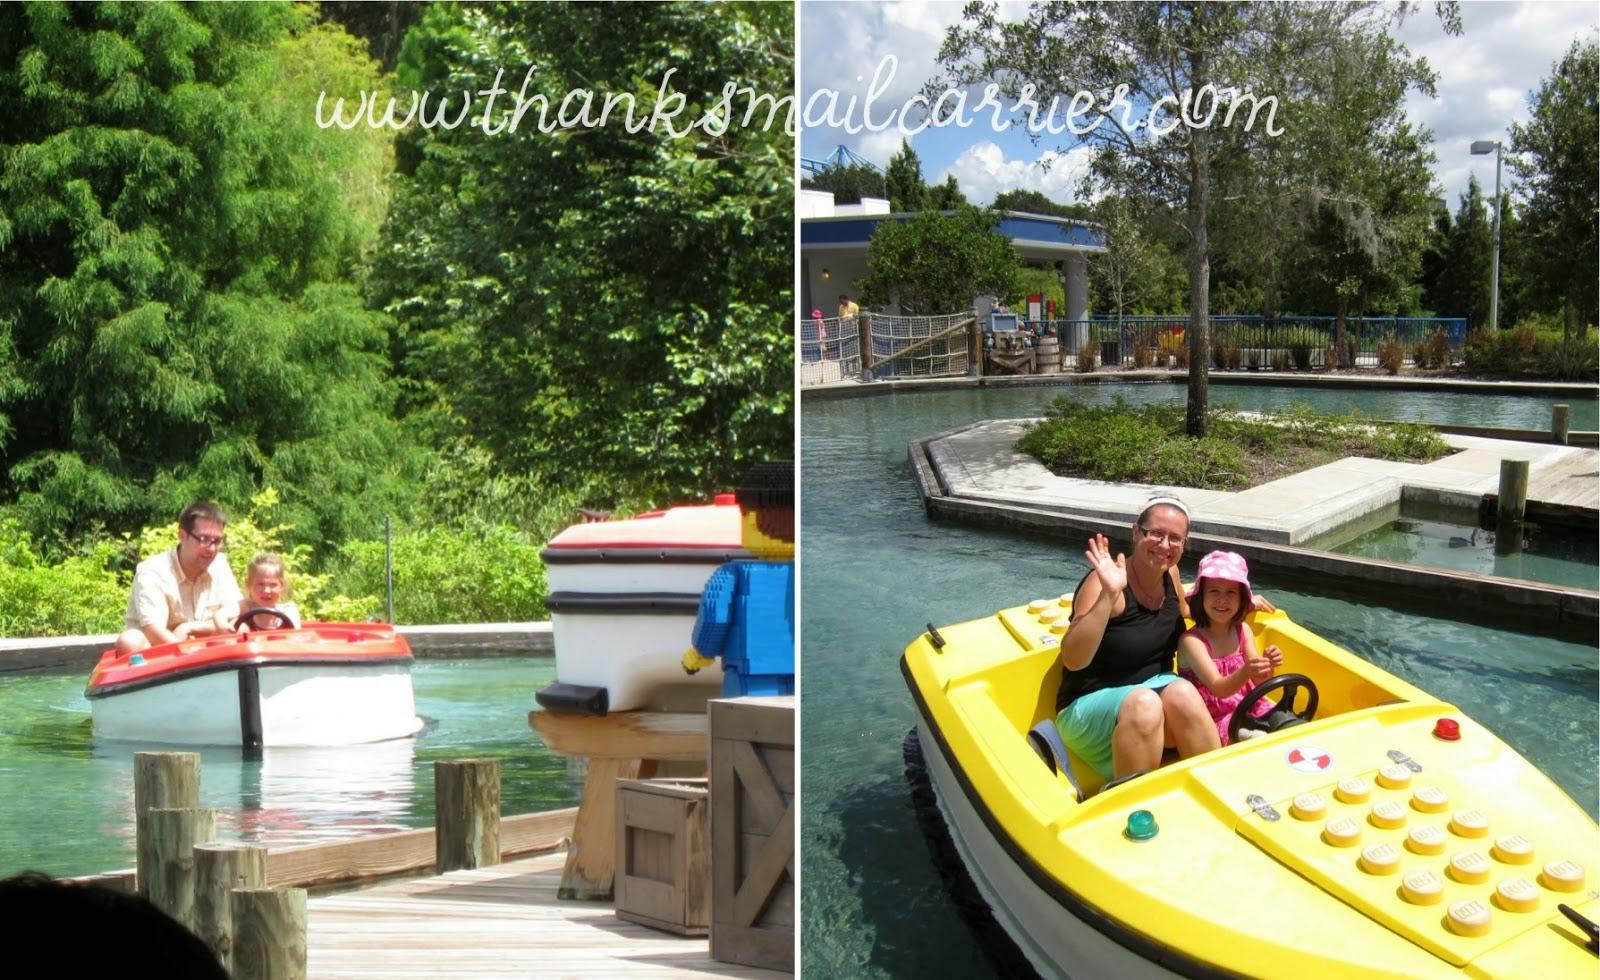 Legoland boats